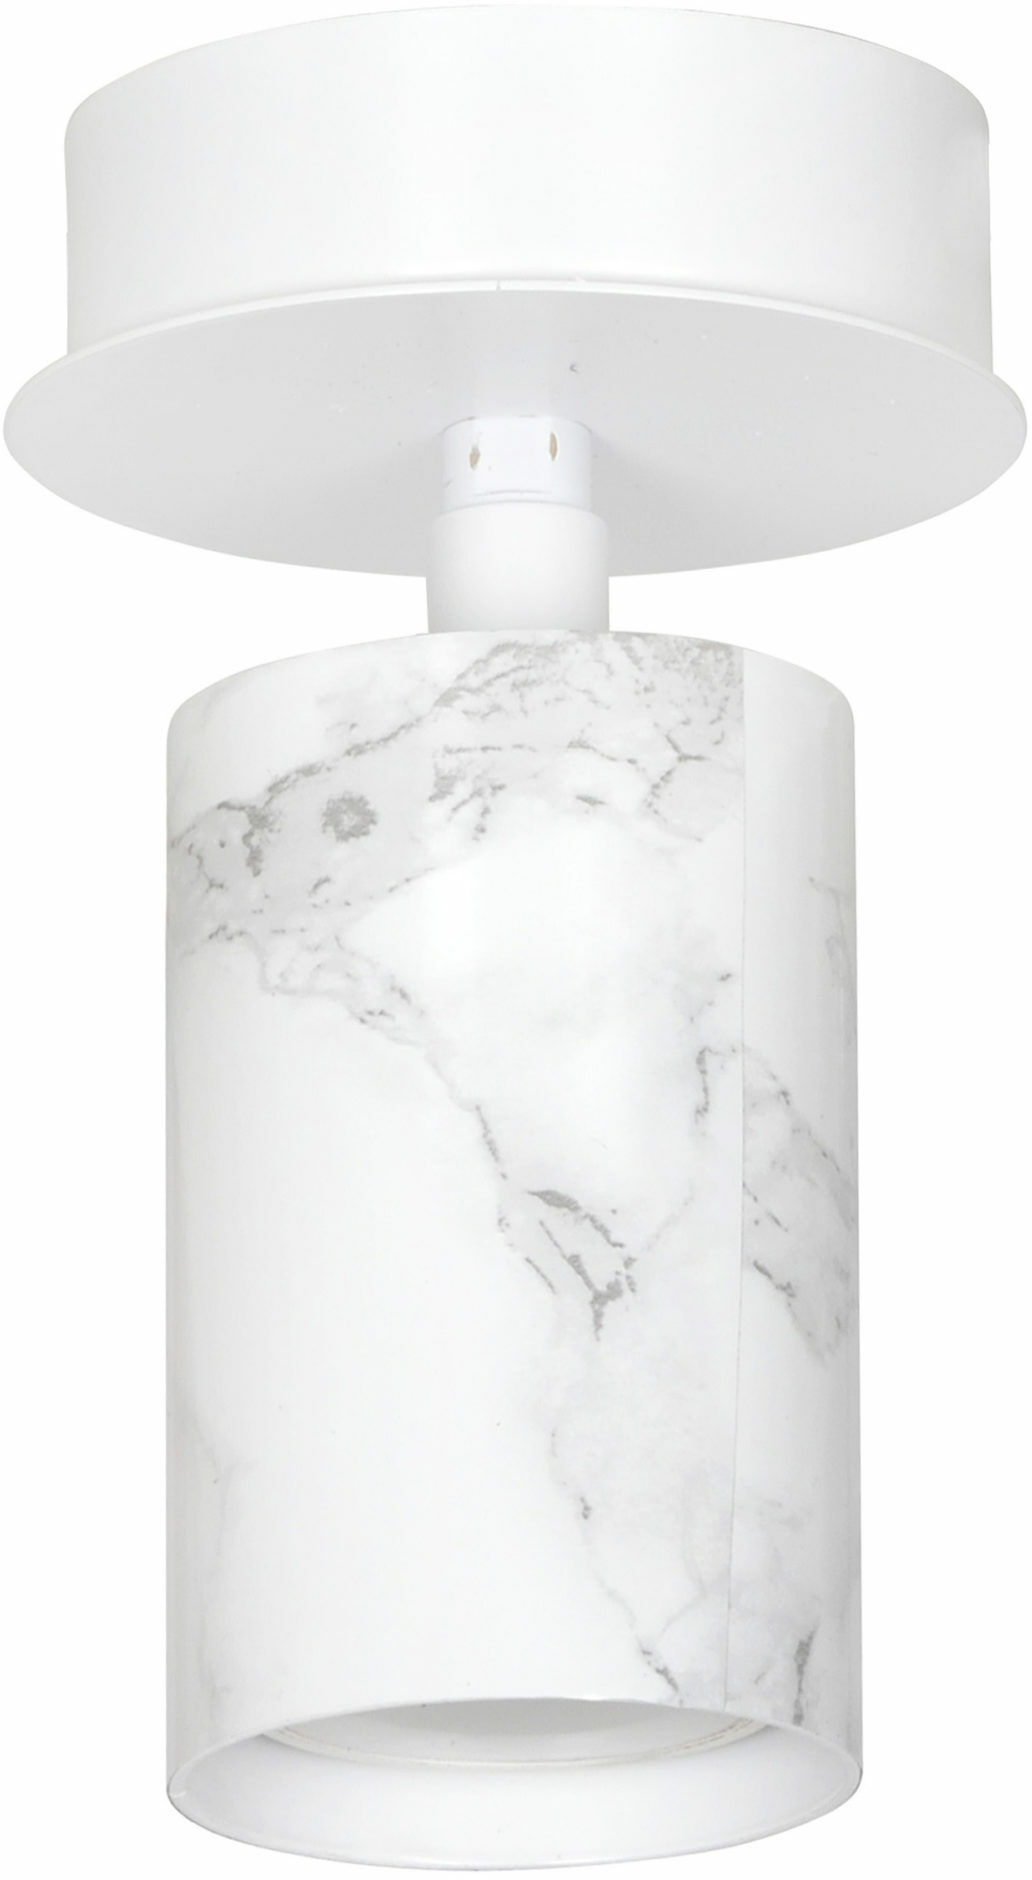 Emibig TENT 1 WHITE 592/1 plafon lampa sufitowa reflektor halogen LED regulowany biały 1x30W Gu10 8cm